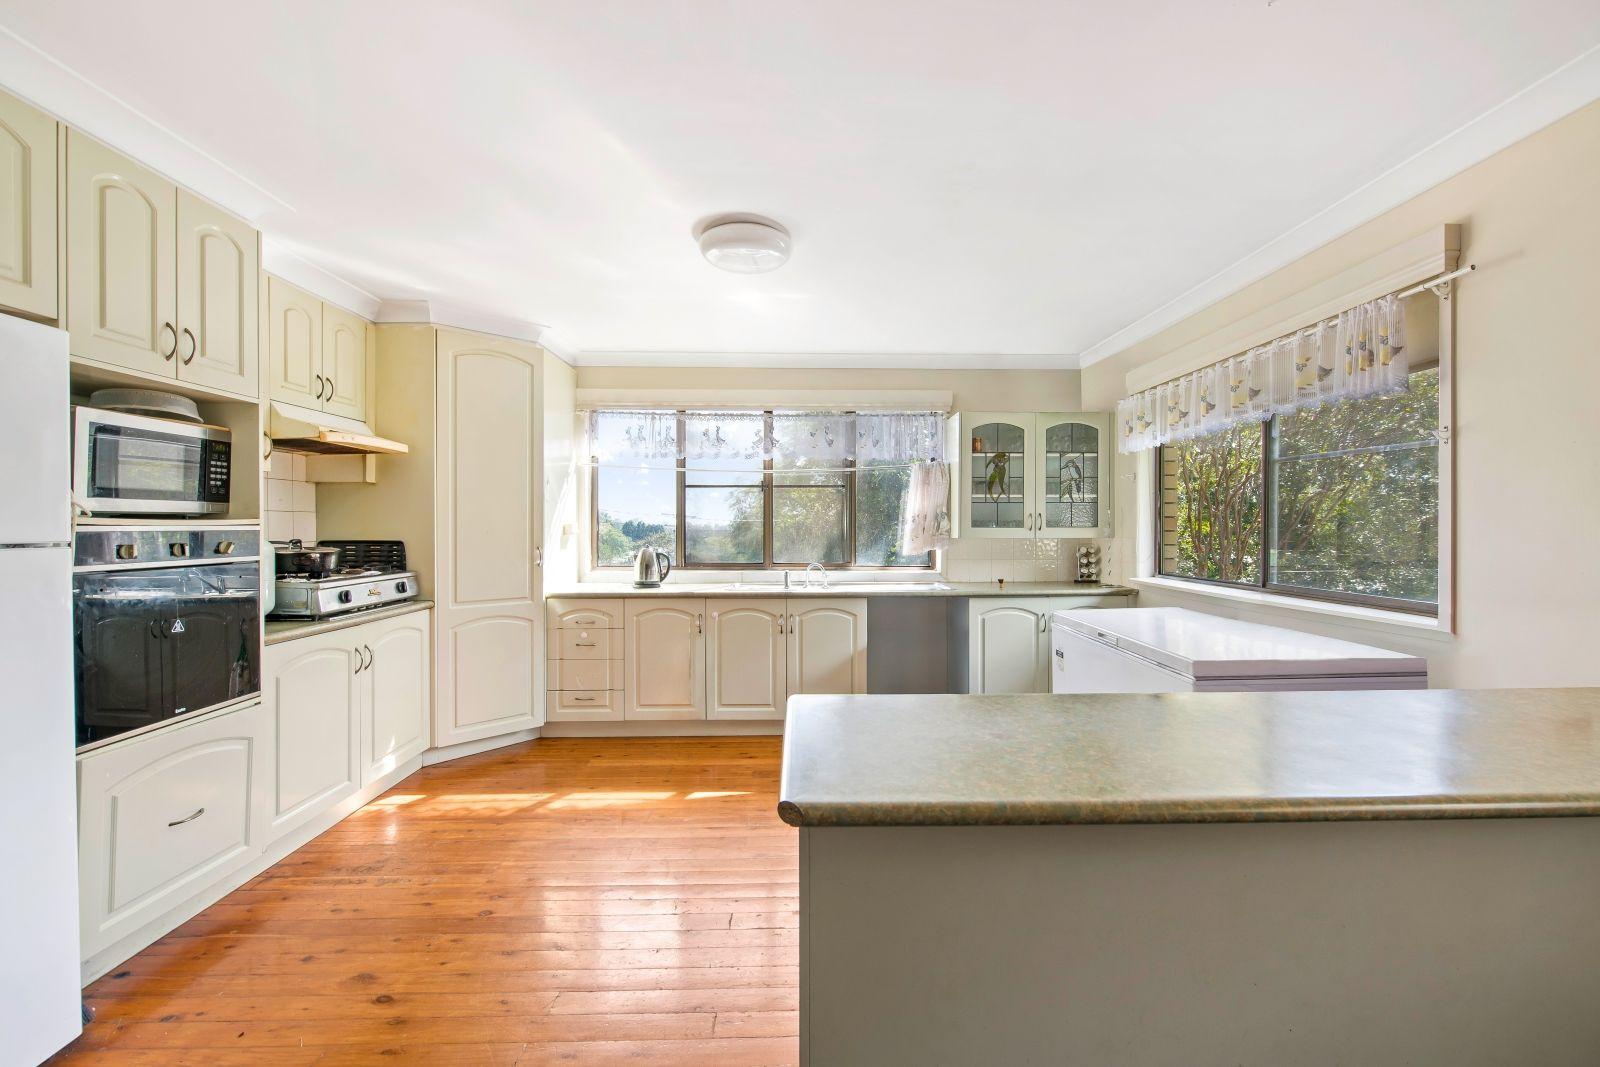 10 Herronbee Street, Rangeville QLD 4350, Image 1